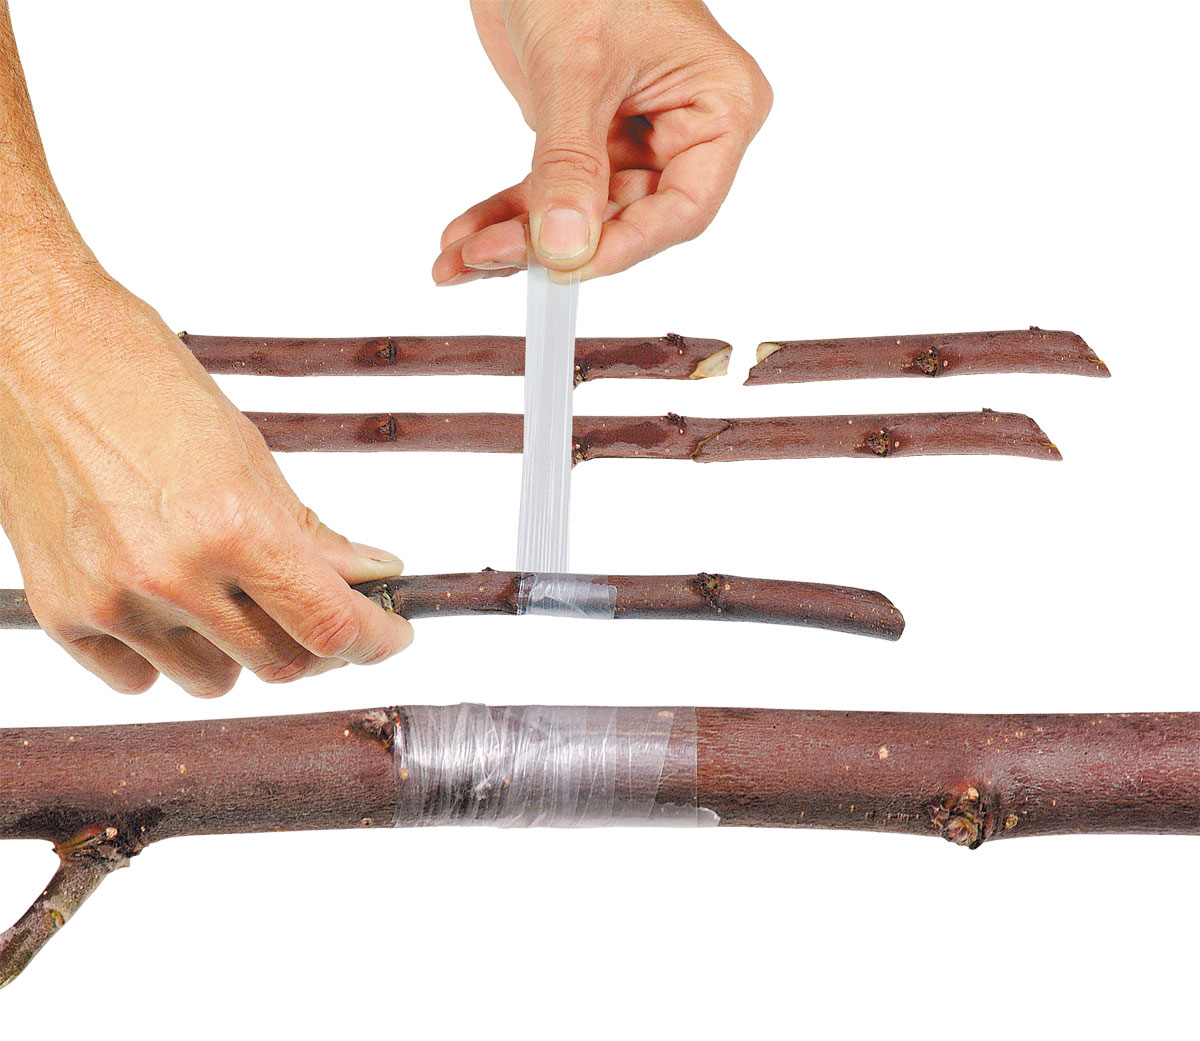 Banda pentru altoit Stocker fara perforatii